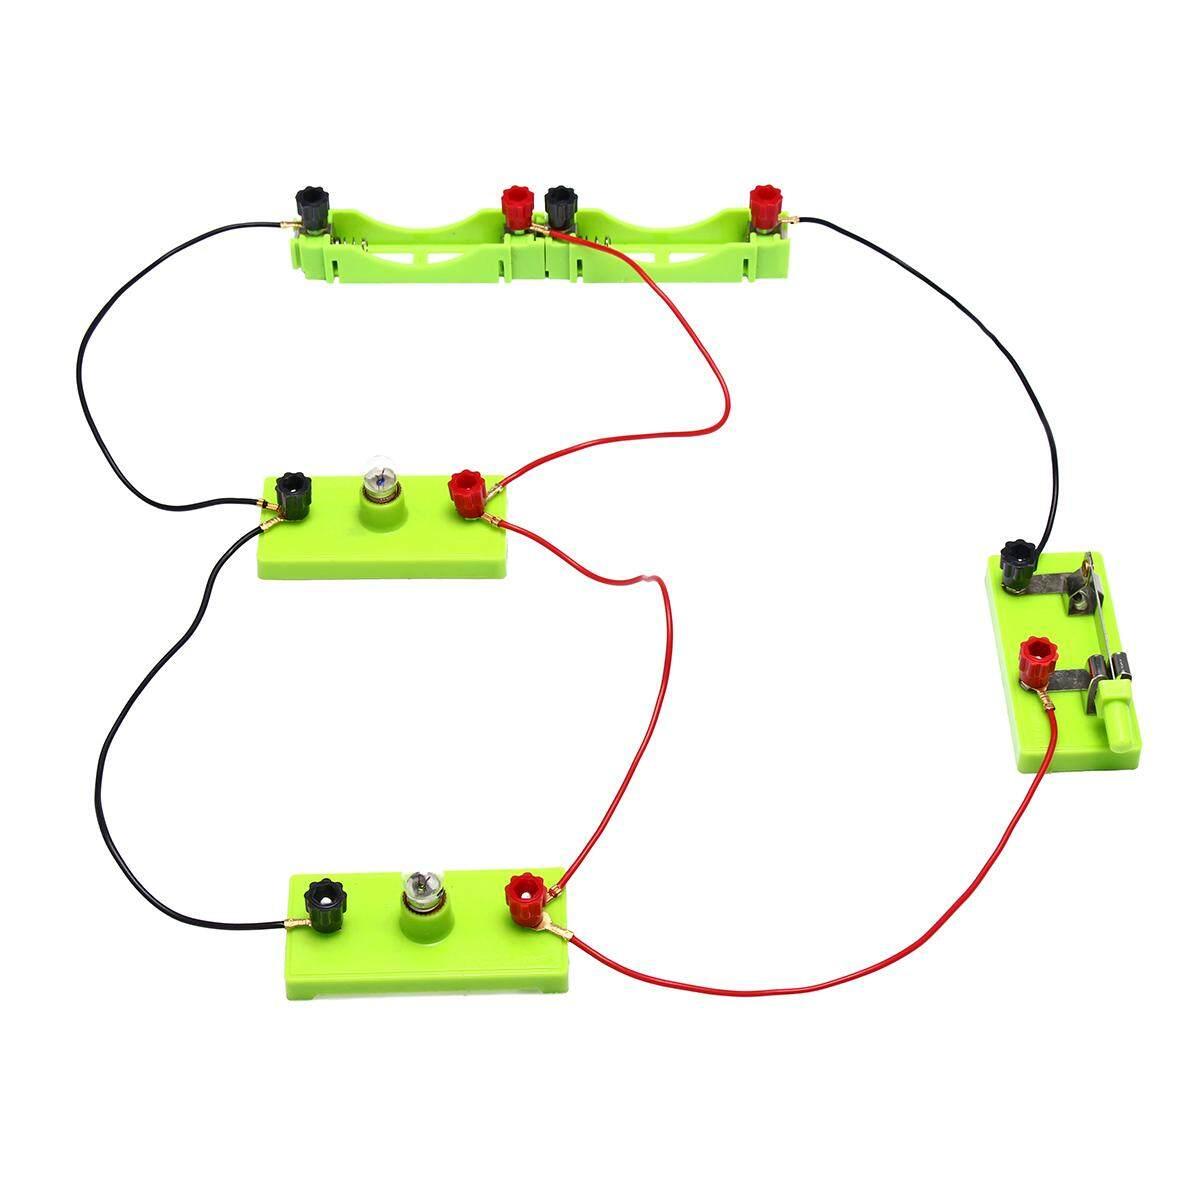 Features Technic Electronics Blocks Kit Kids Toys Snap Circuits Electronic Circuit Toy Electric Student School Science Montessori Educational New